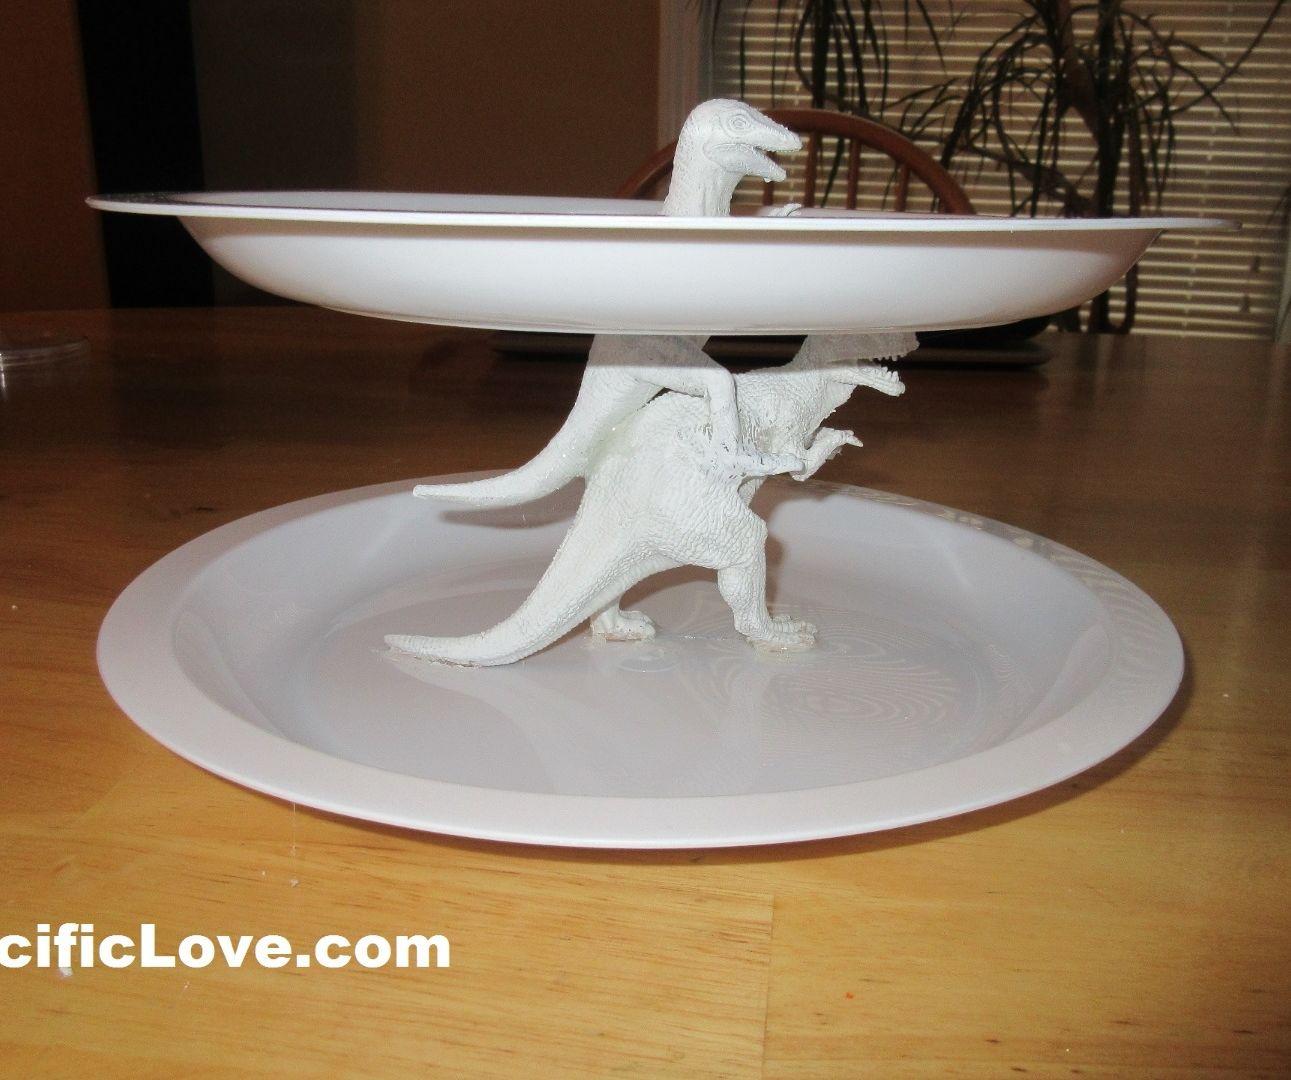 Dinosaur Serving Dish - DIY Crafts